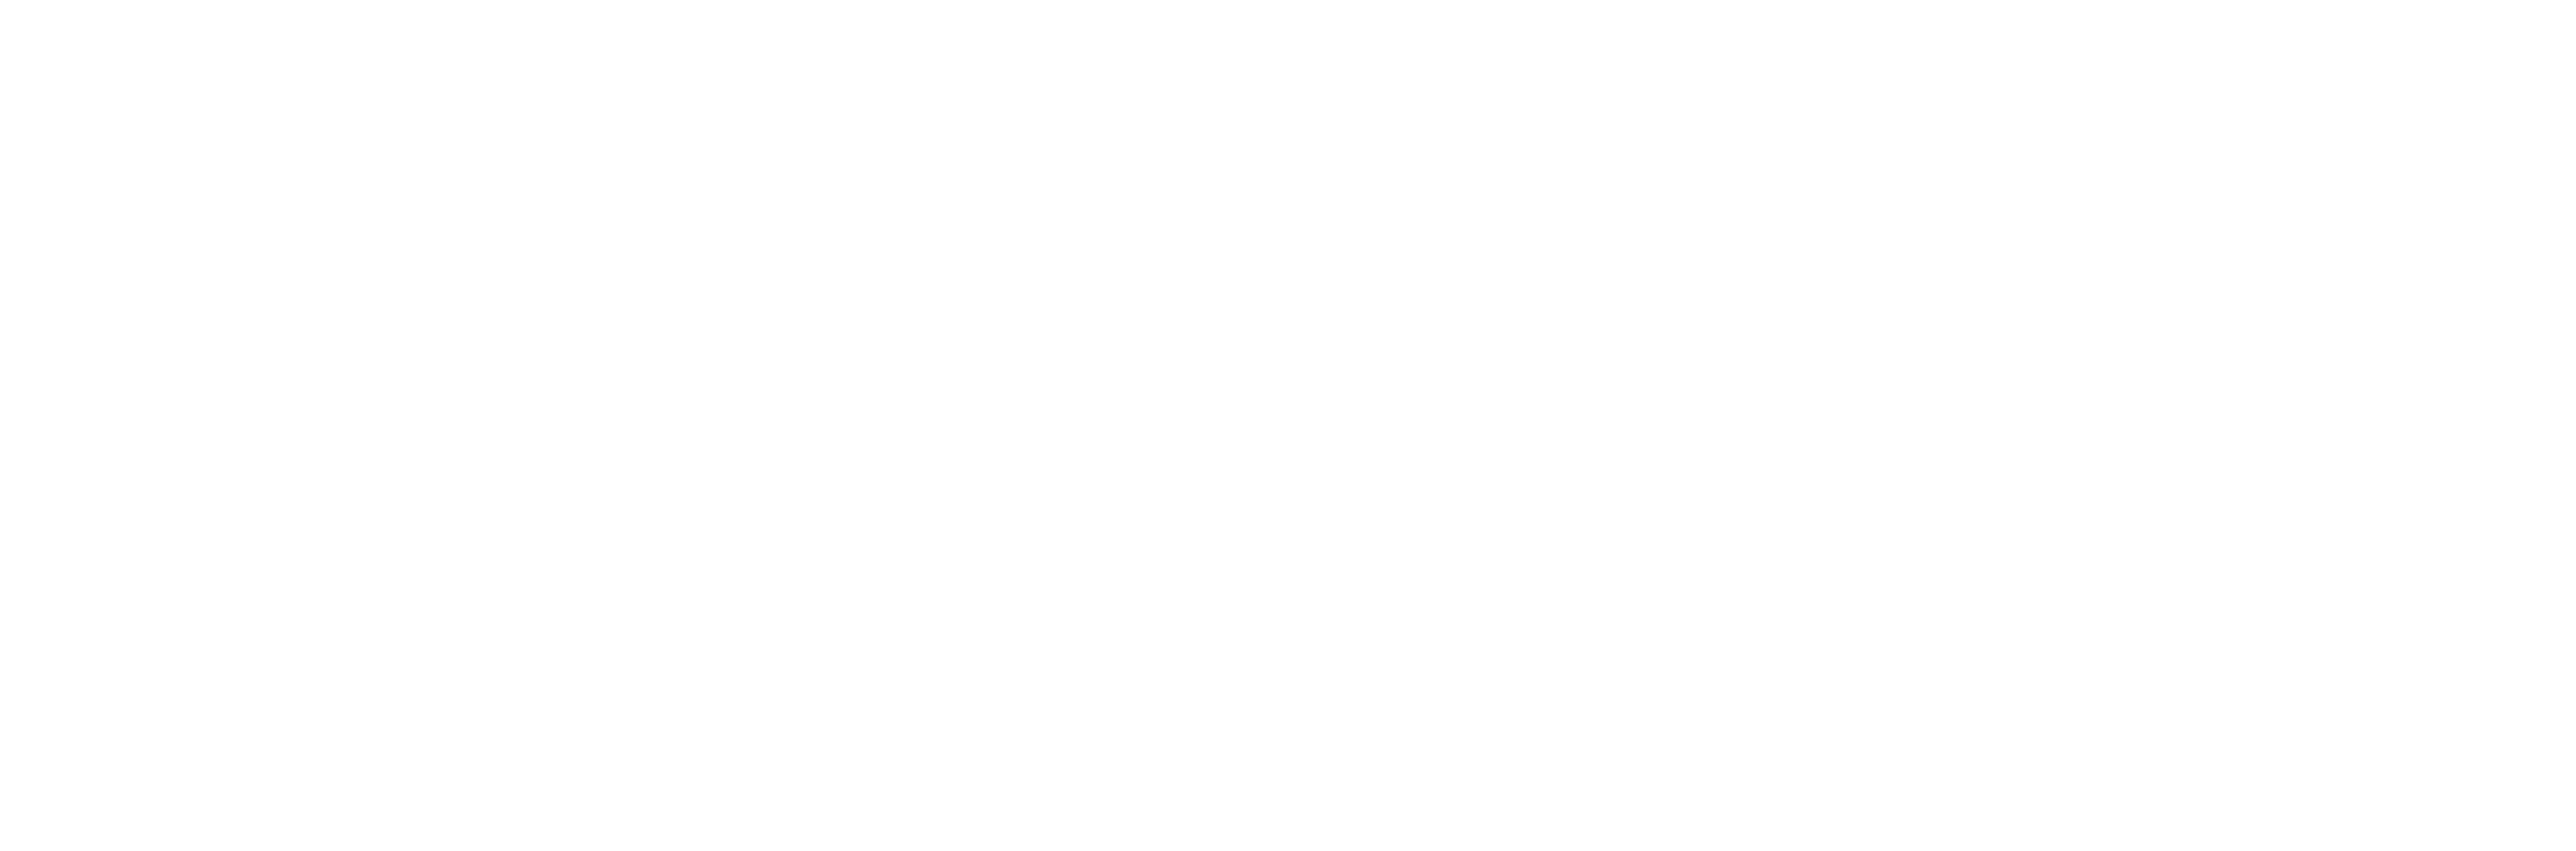 VR Arcade bold test-06